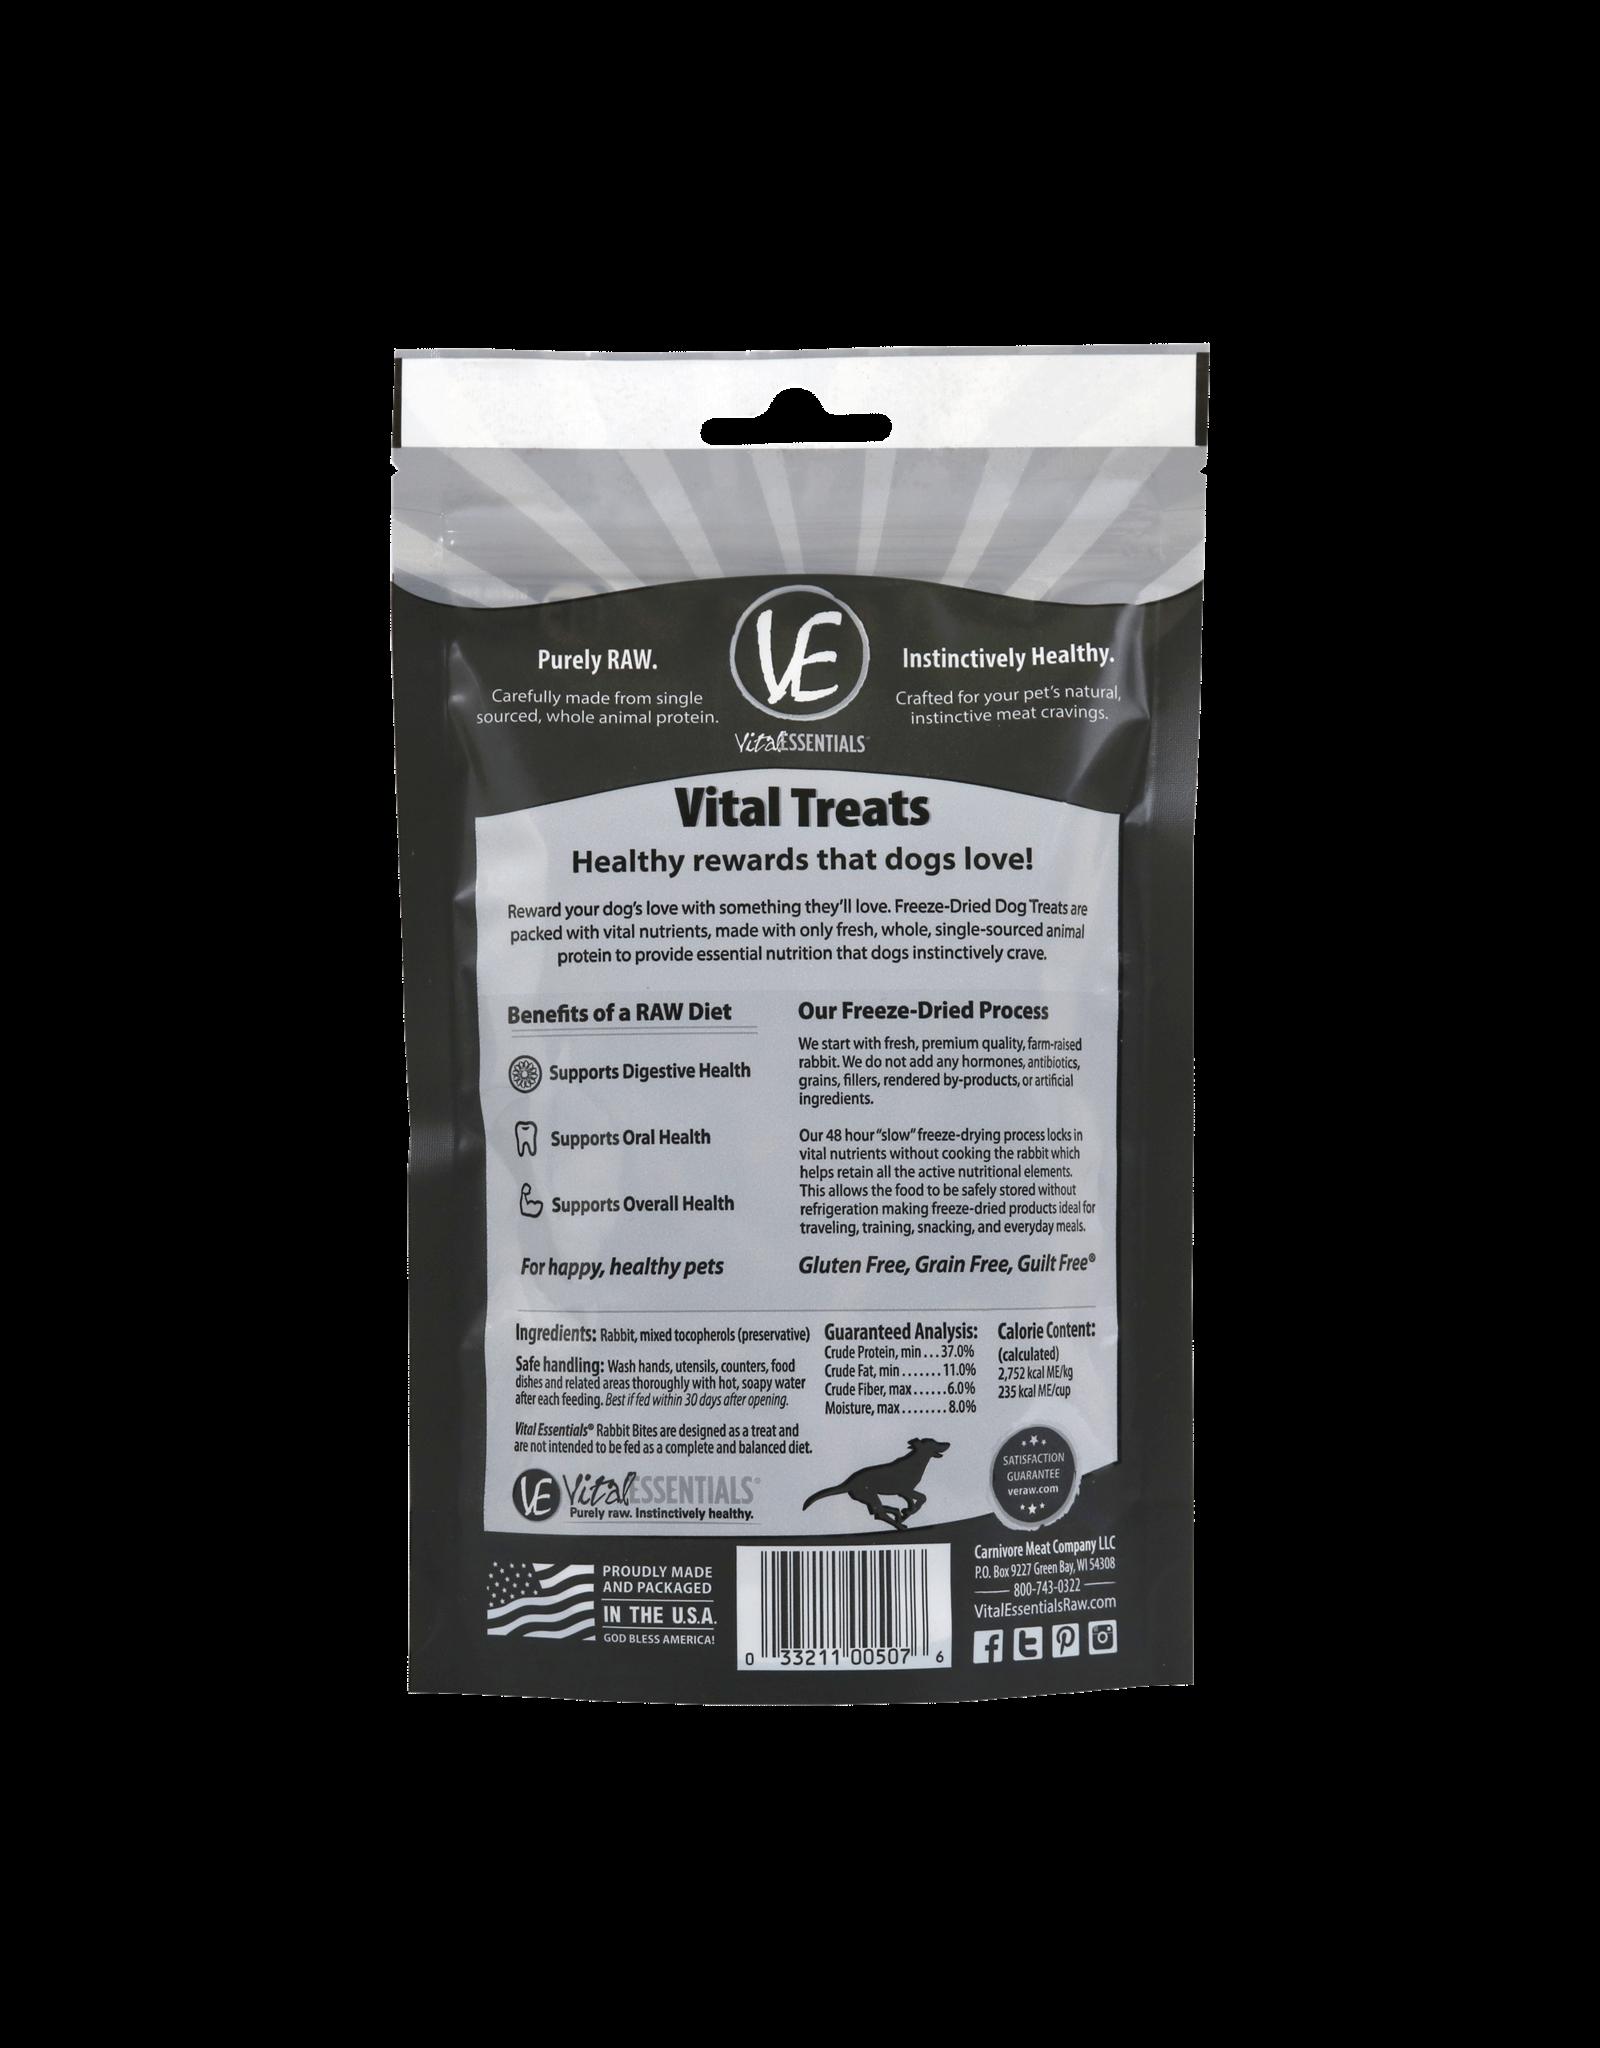 Rabbit Bites Freeze-Dried Grain Free Treats